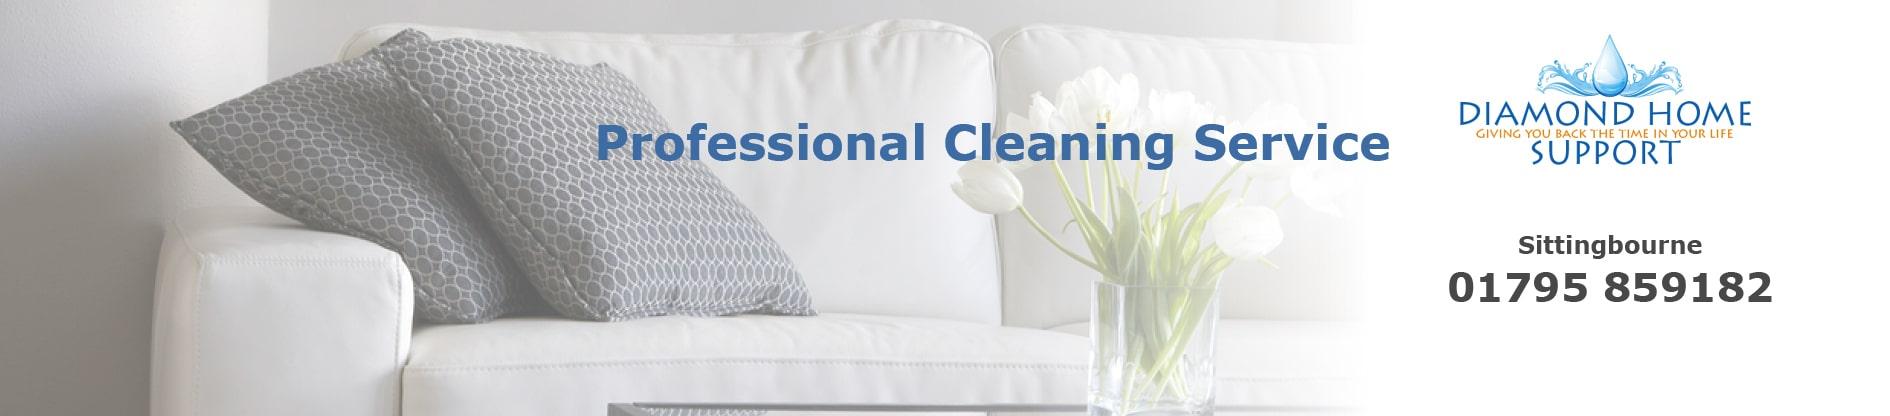 Cleaners in Sittingbourne